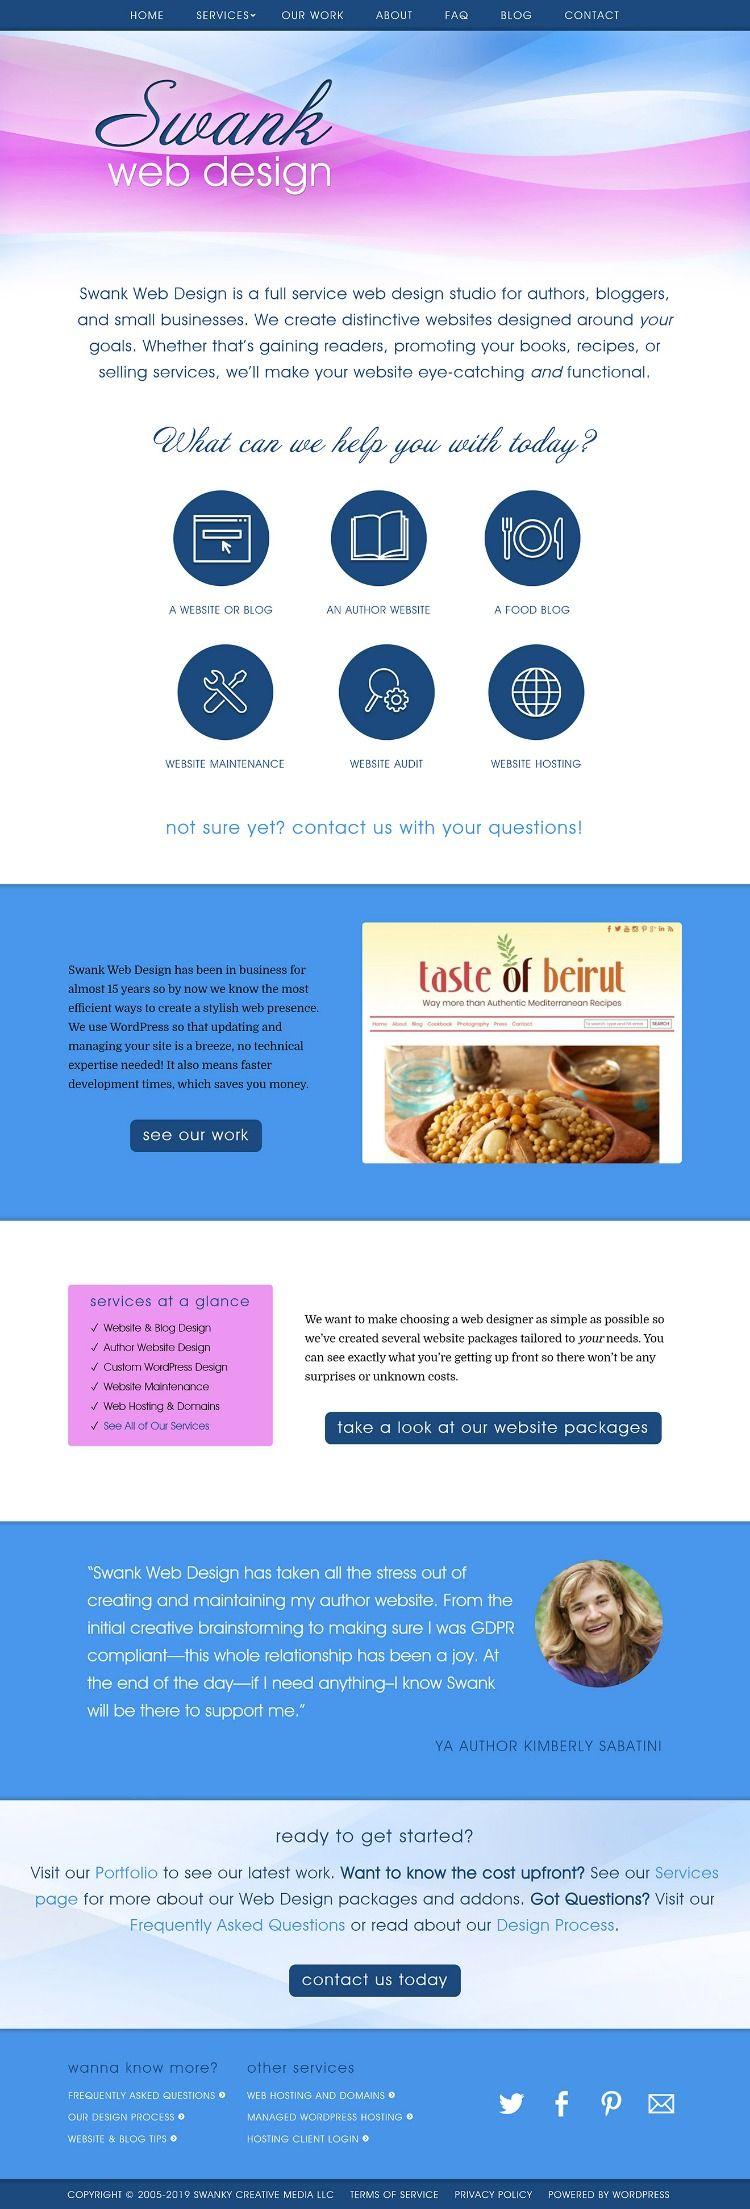 Welcome To Web Design Food Blog Design